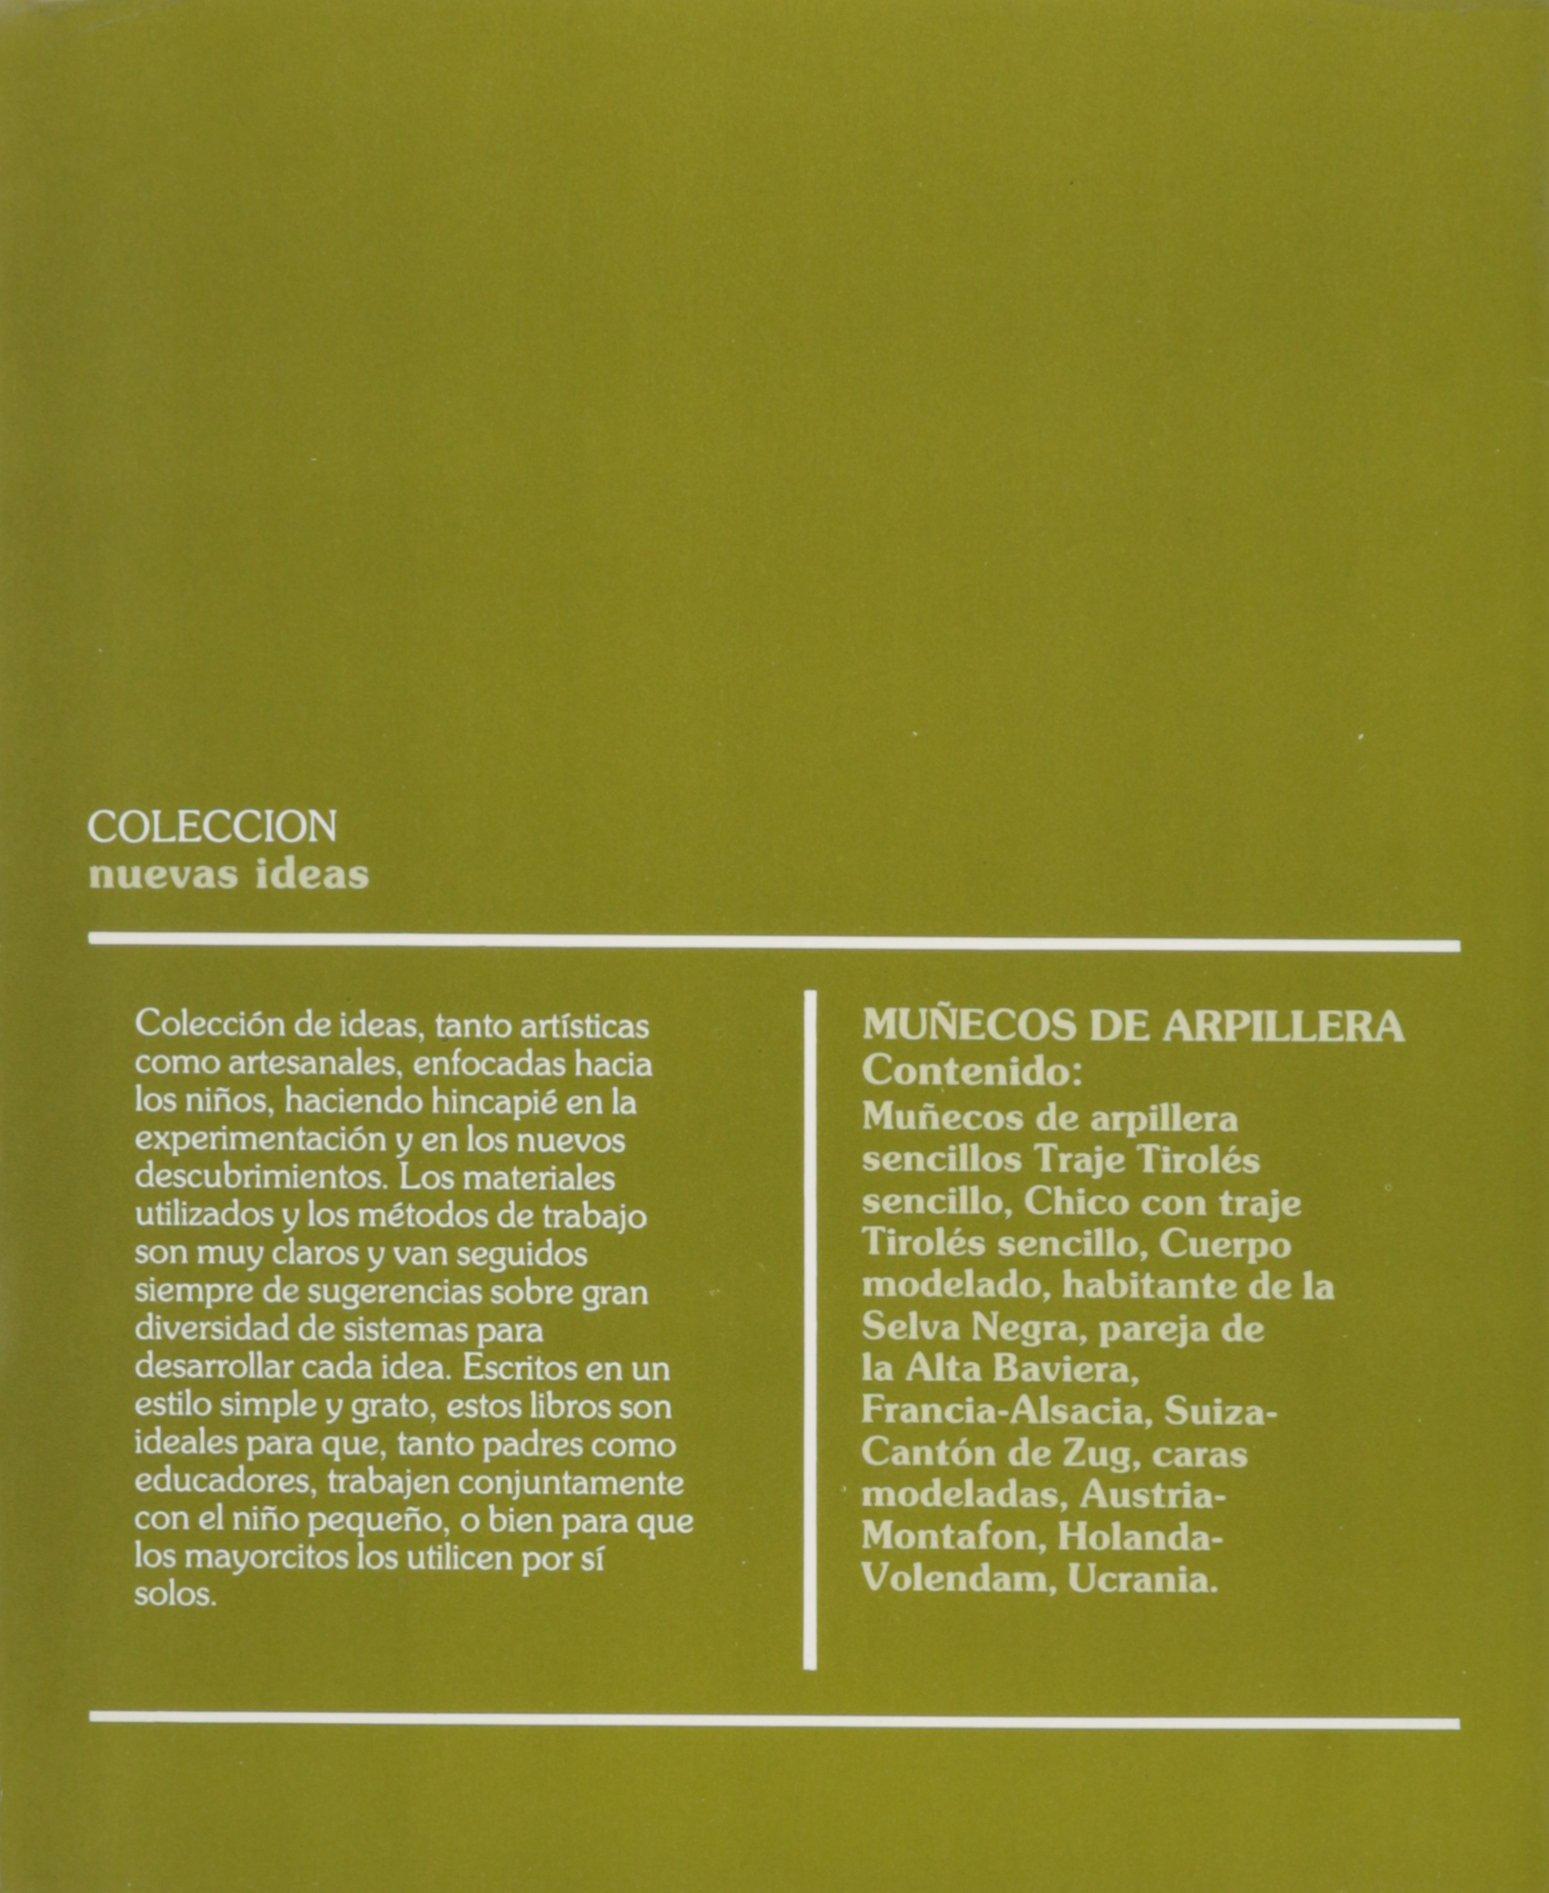 Munecos de Arpillera (Spanish Edition): Ceac: 9788432984112 ...